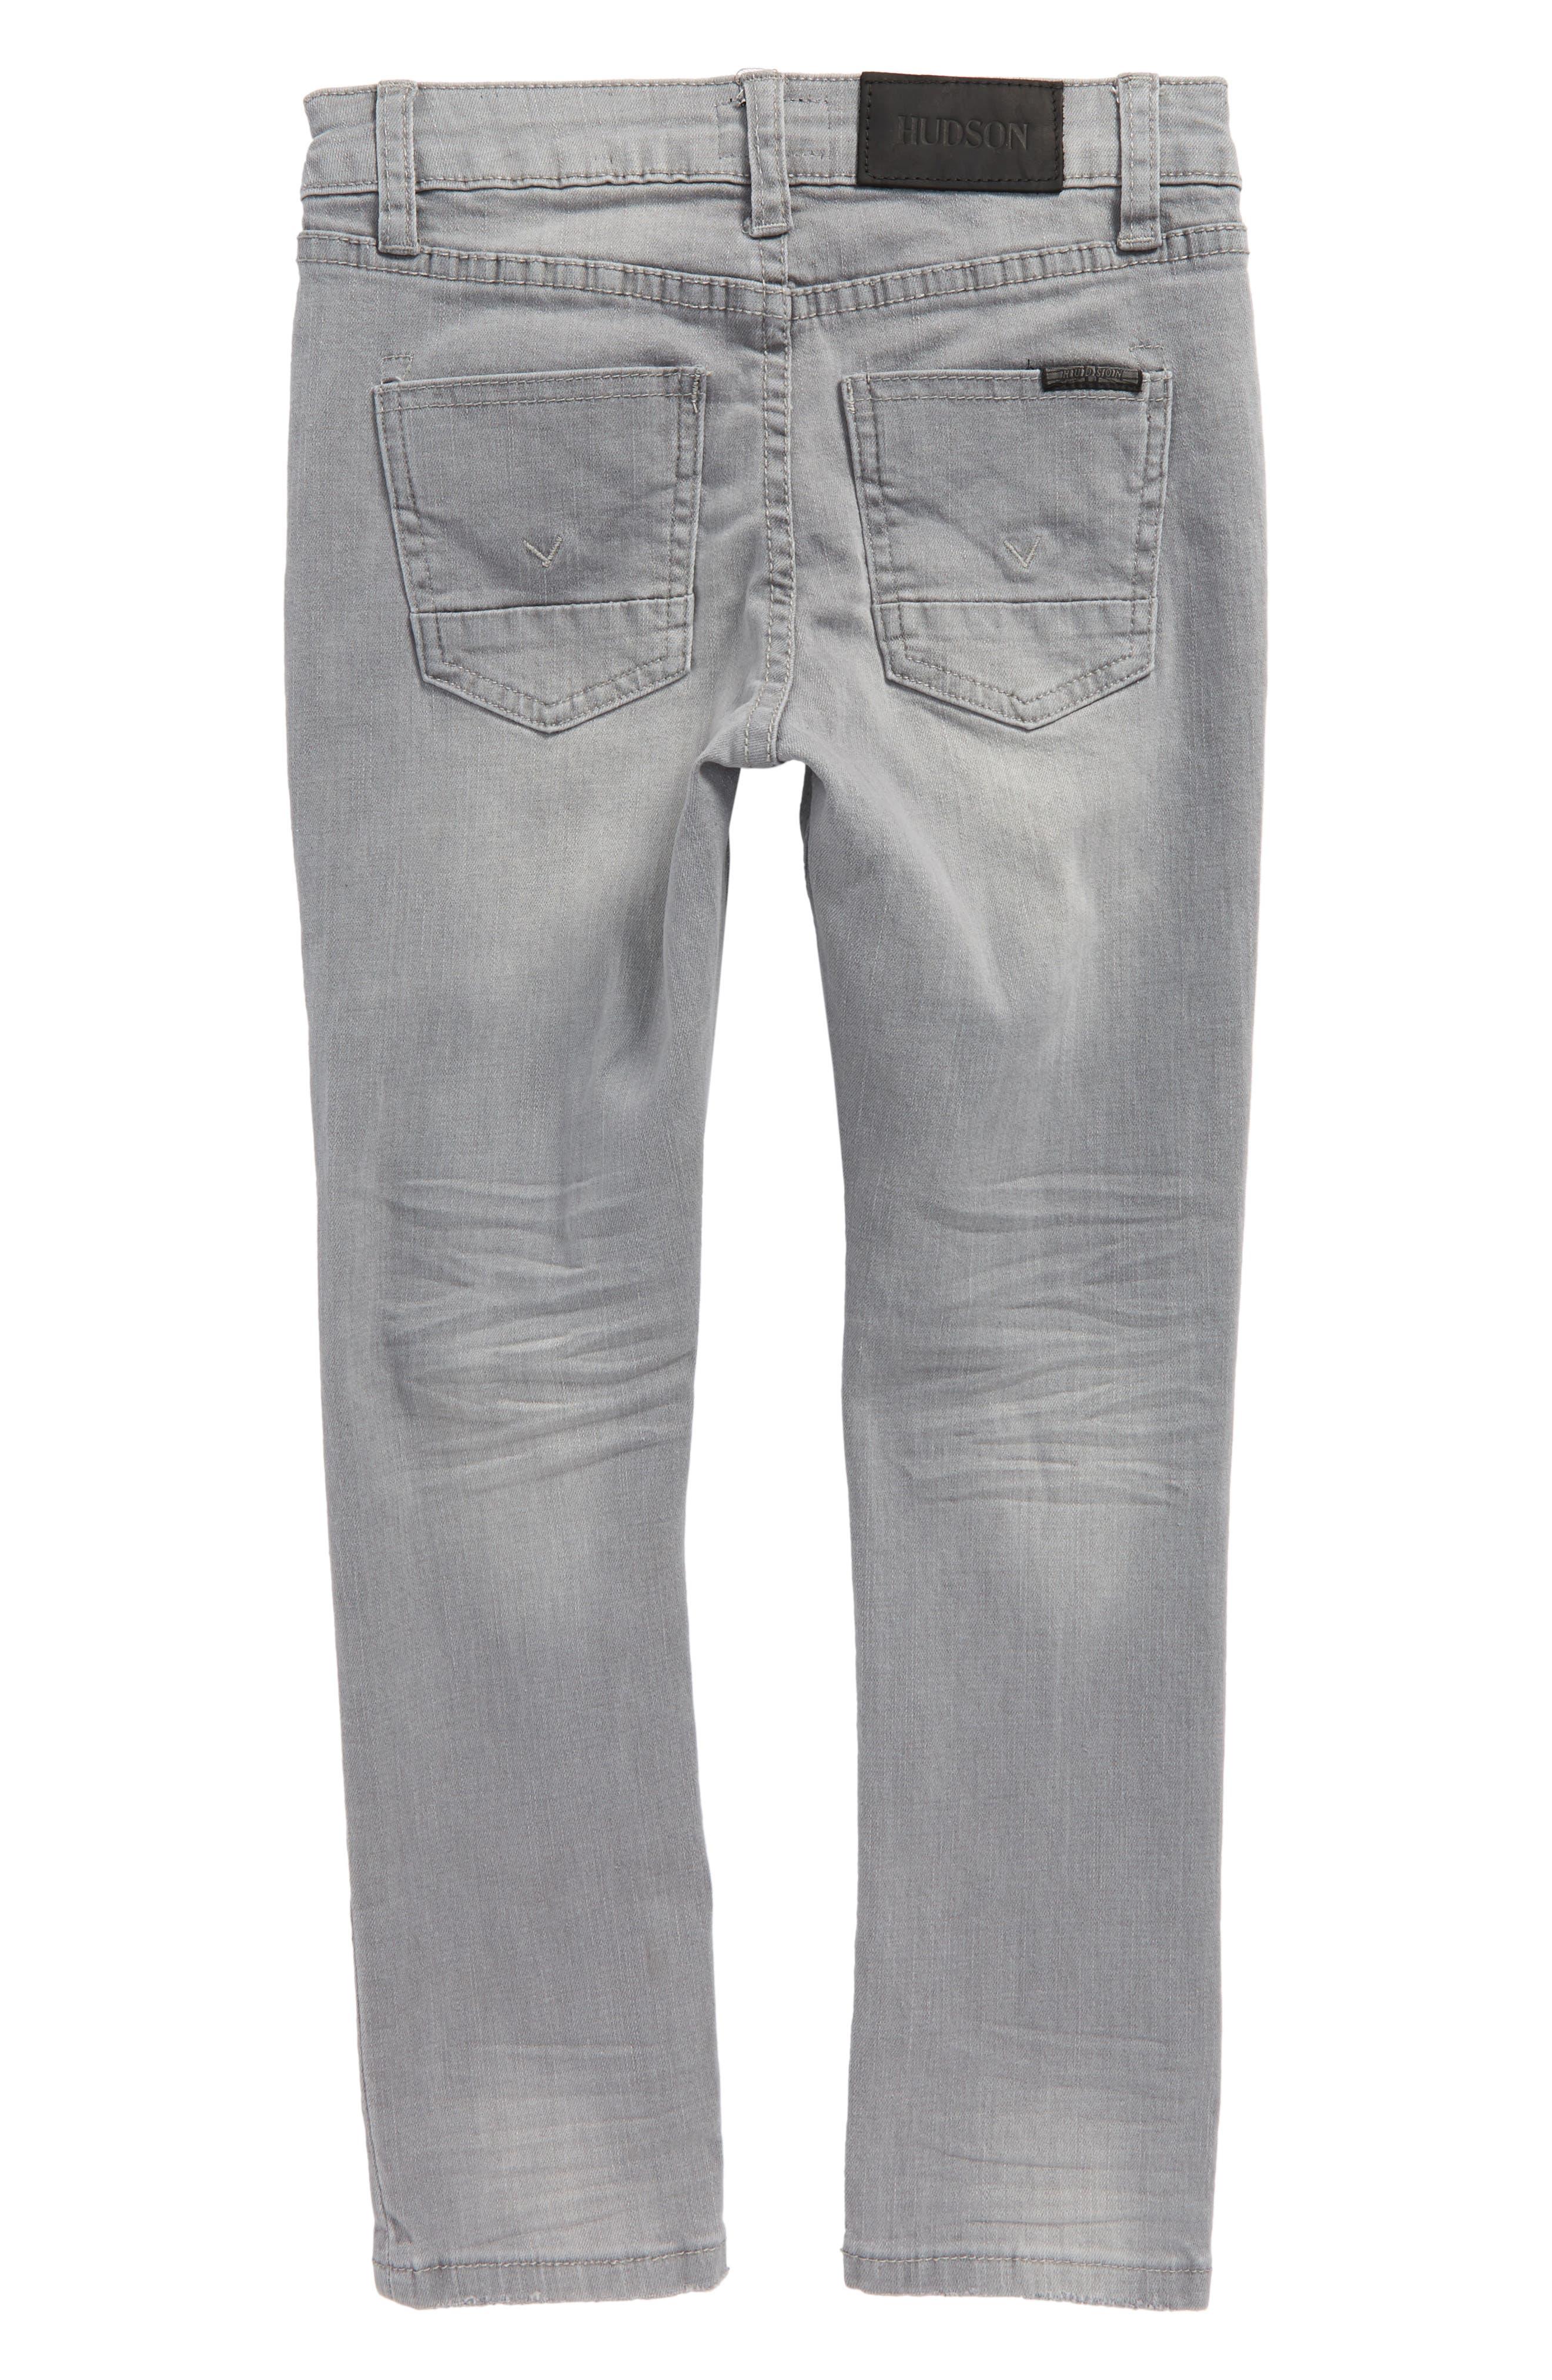 Jude Slim Fit Skinny Jeans,                             Alternate thumbnail 2, color,                             051